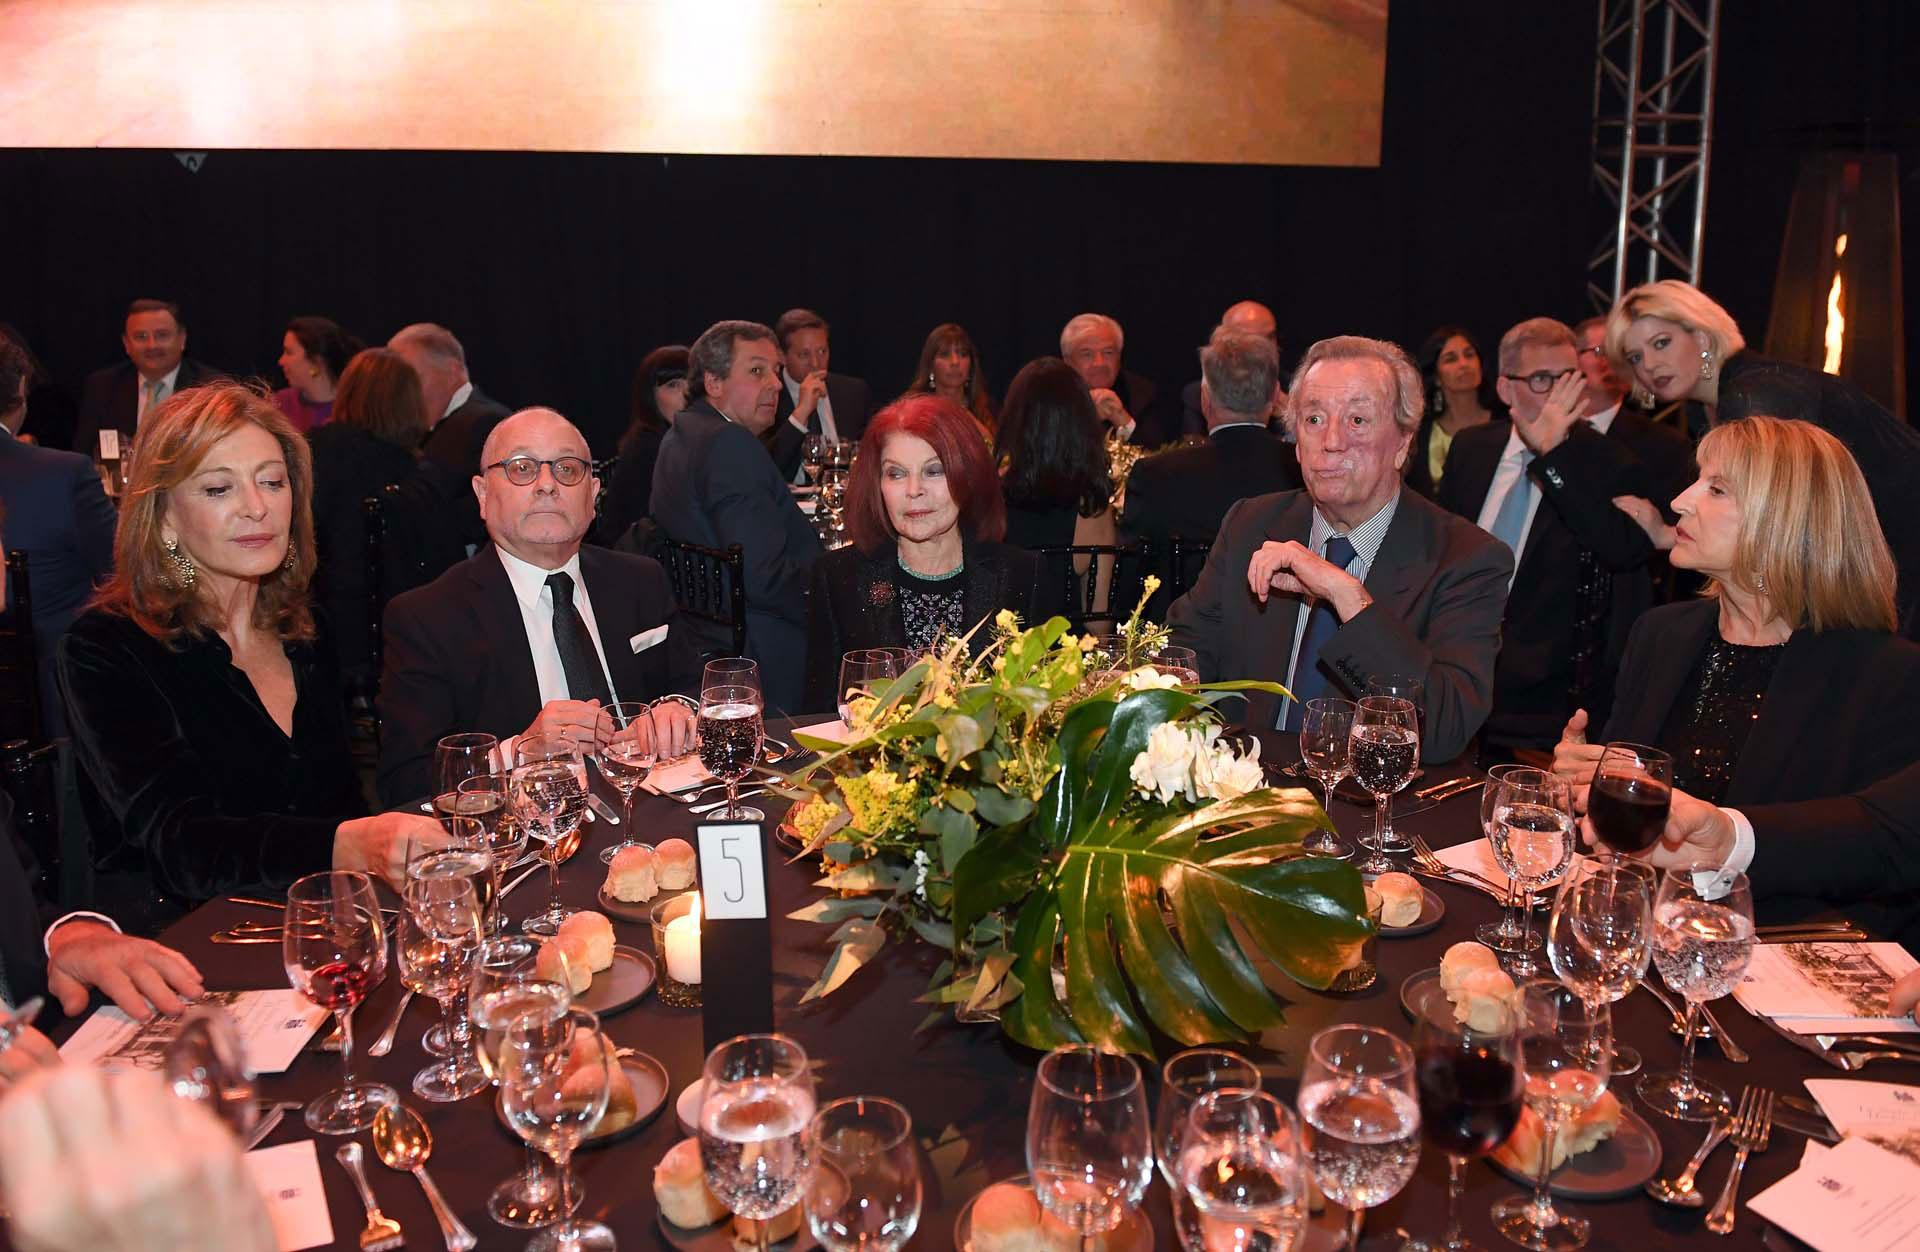 Mariel Llorens de Quintana, Jorge Faurie, Lili Sielecki y Bruno Quintana, ex presidente del Jockey Club